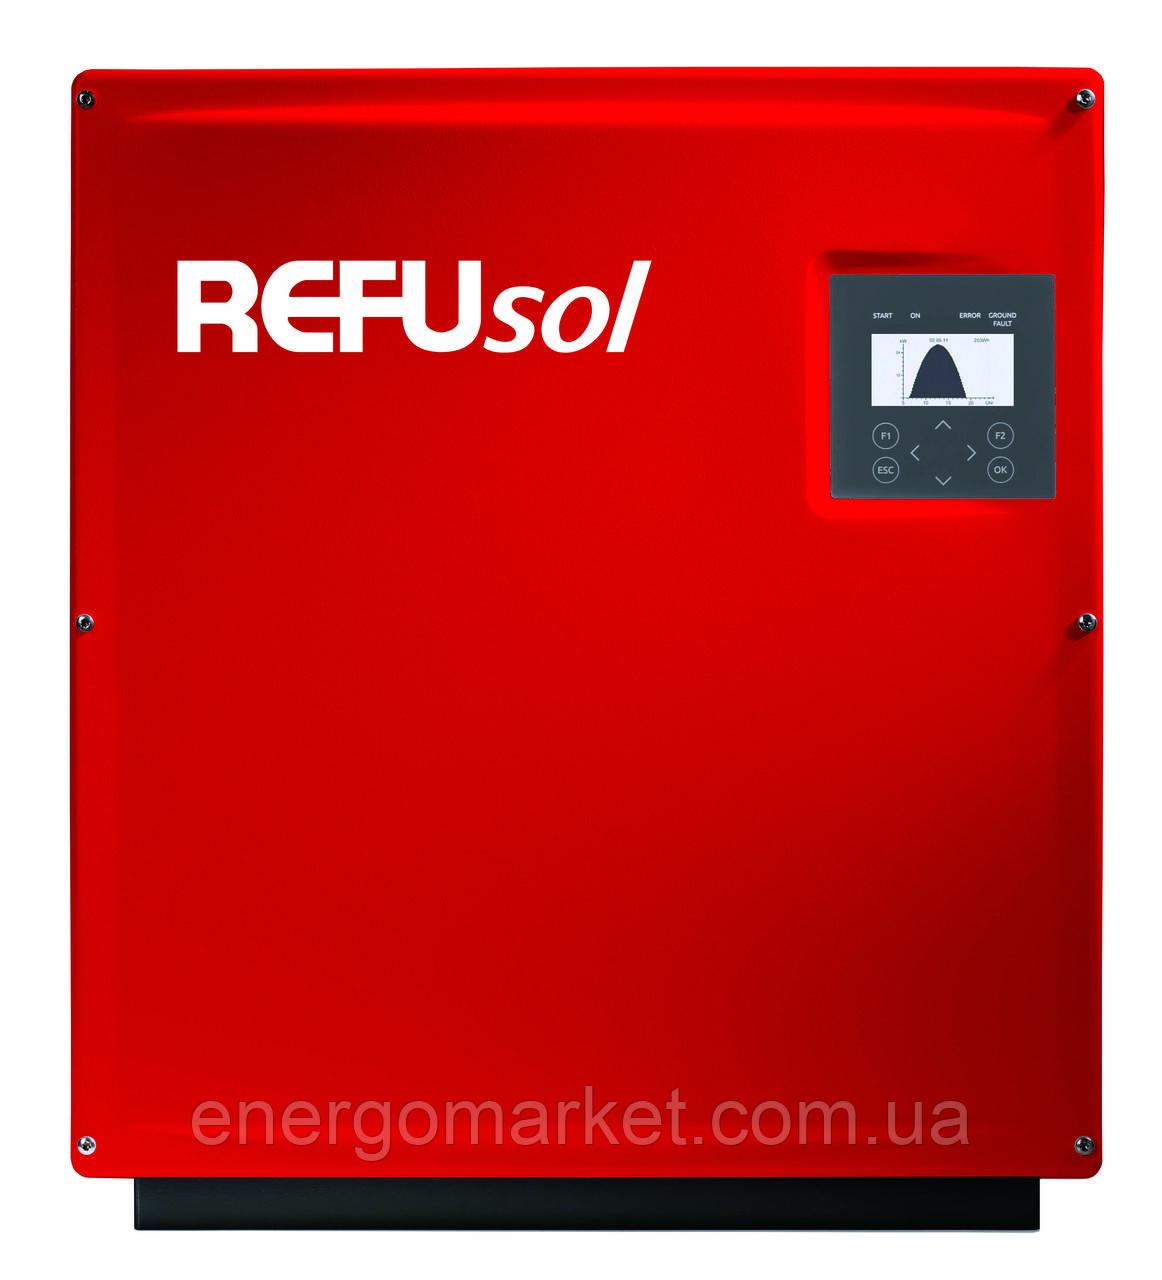 Инвертор REFUsol 40 k 3 фазы МРРТ